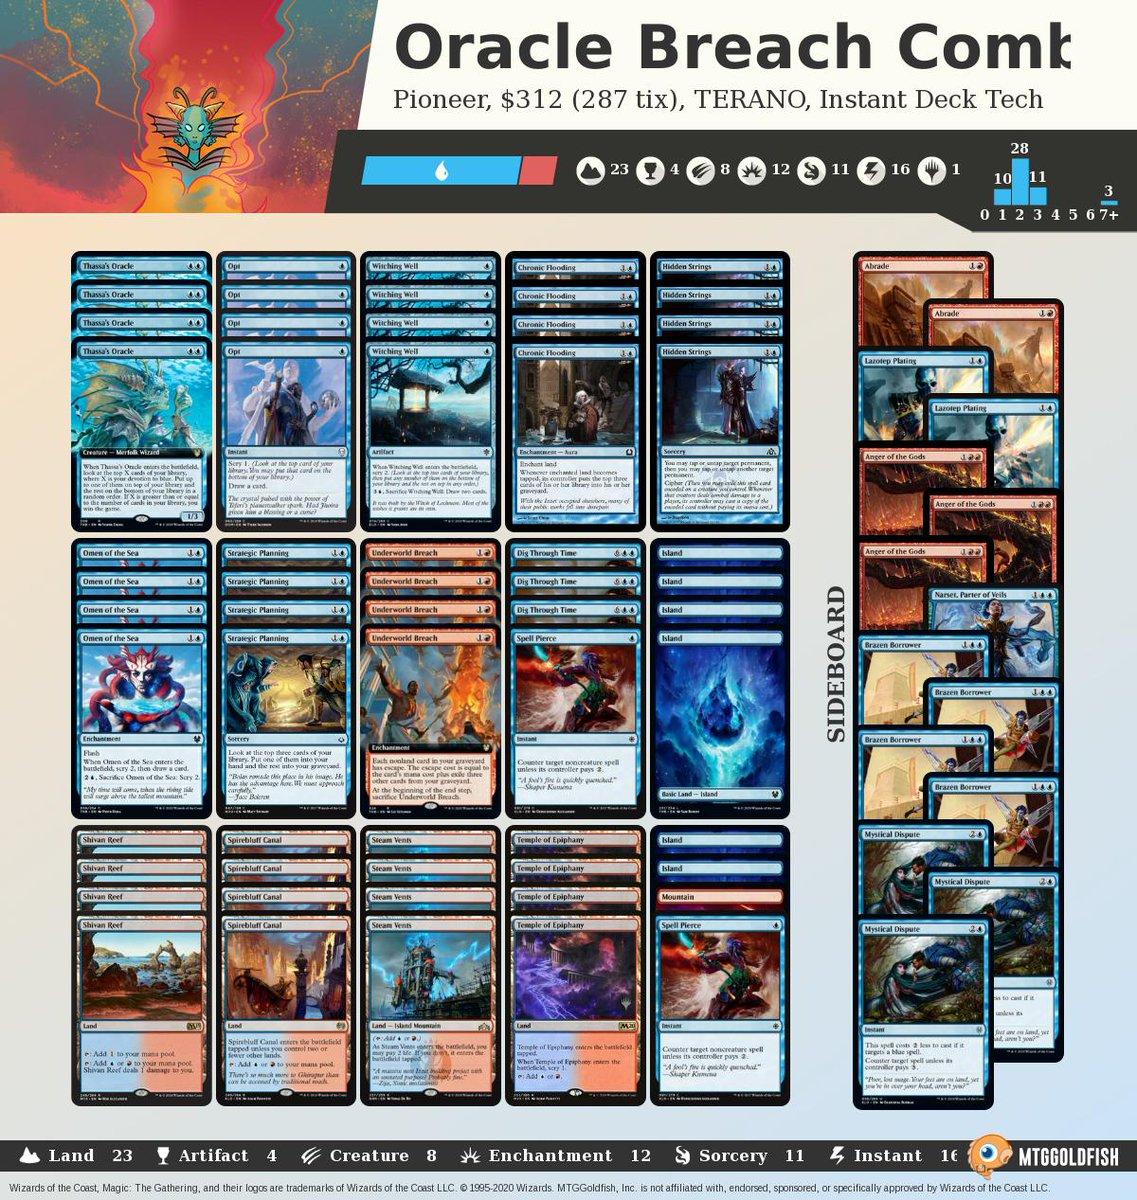 Instant Deck Tech: Oracle Breach Combo (Pioneer) mtggoldfish.com/articles/insta… #instantdecktech